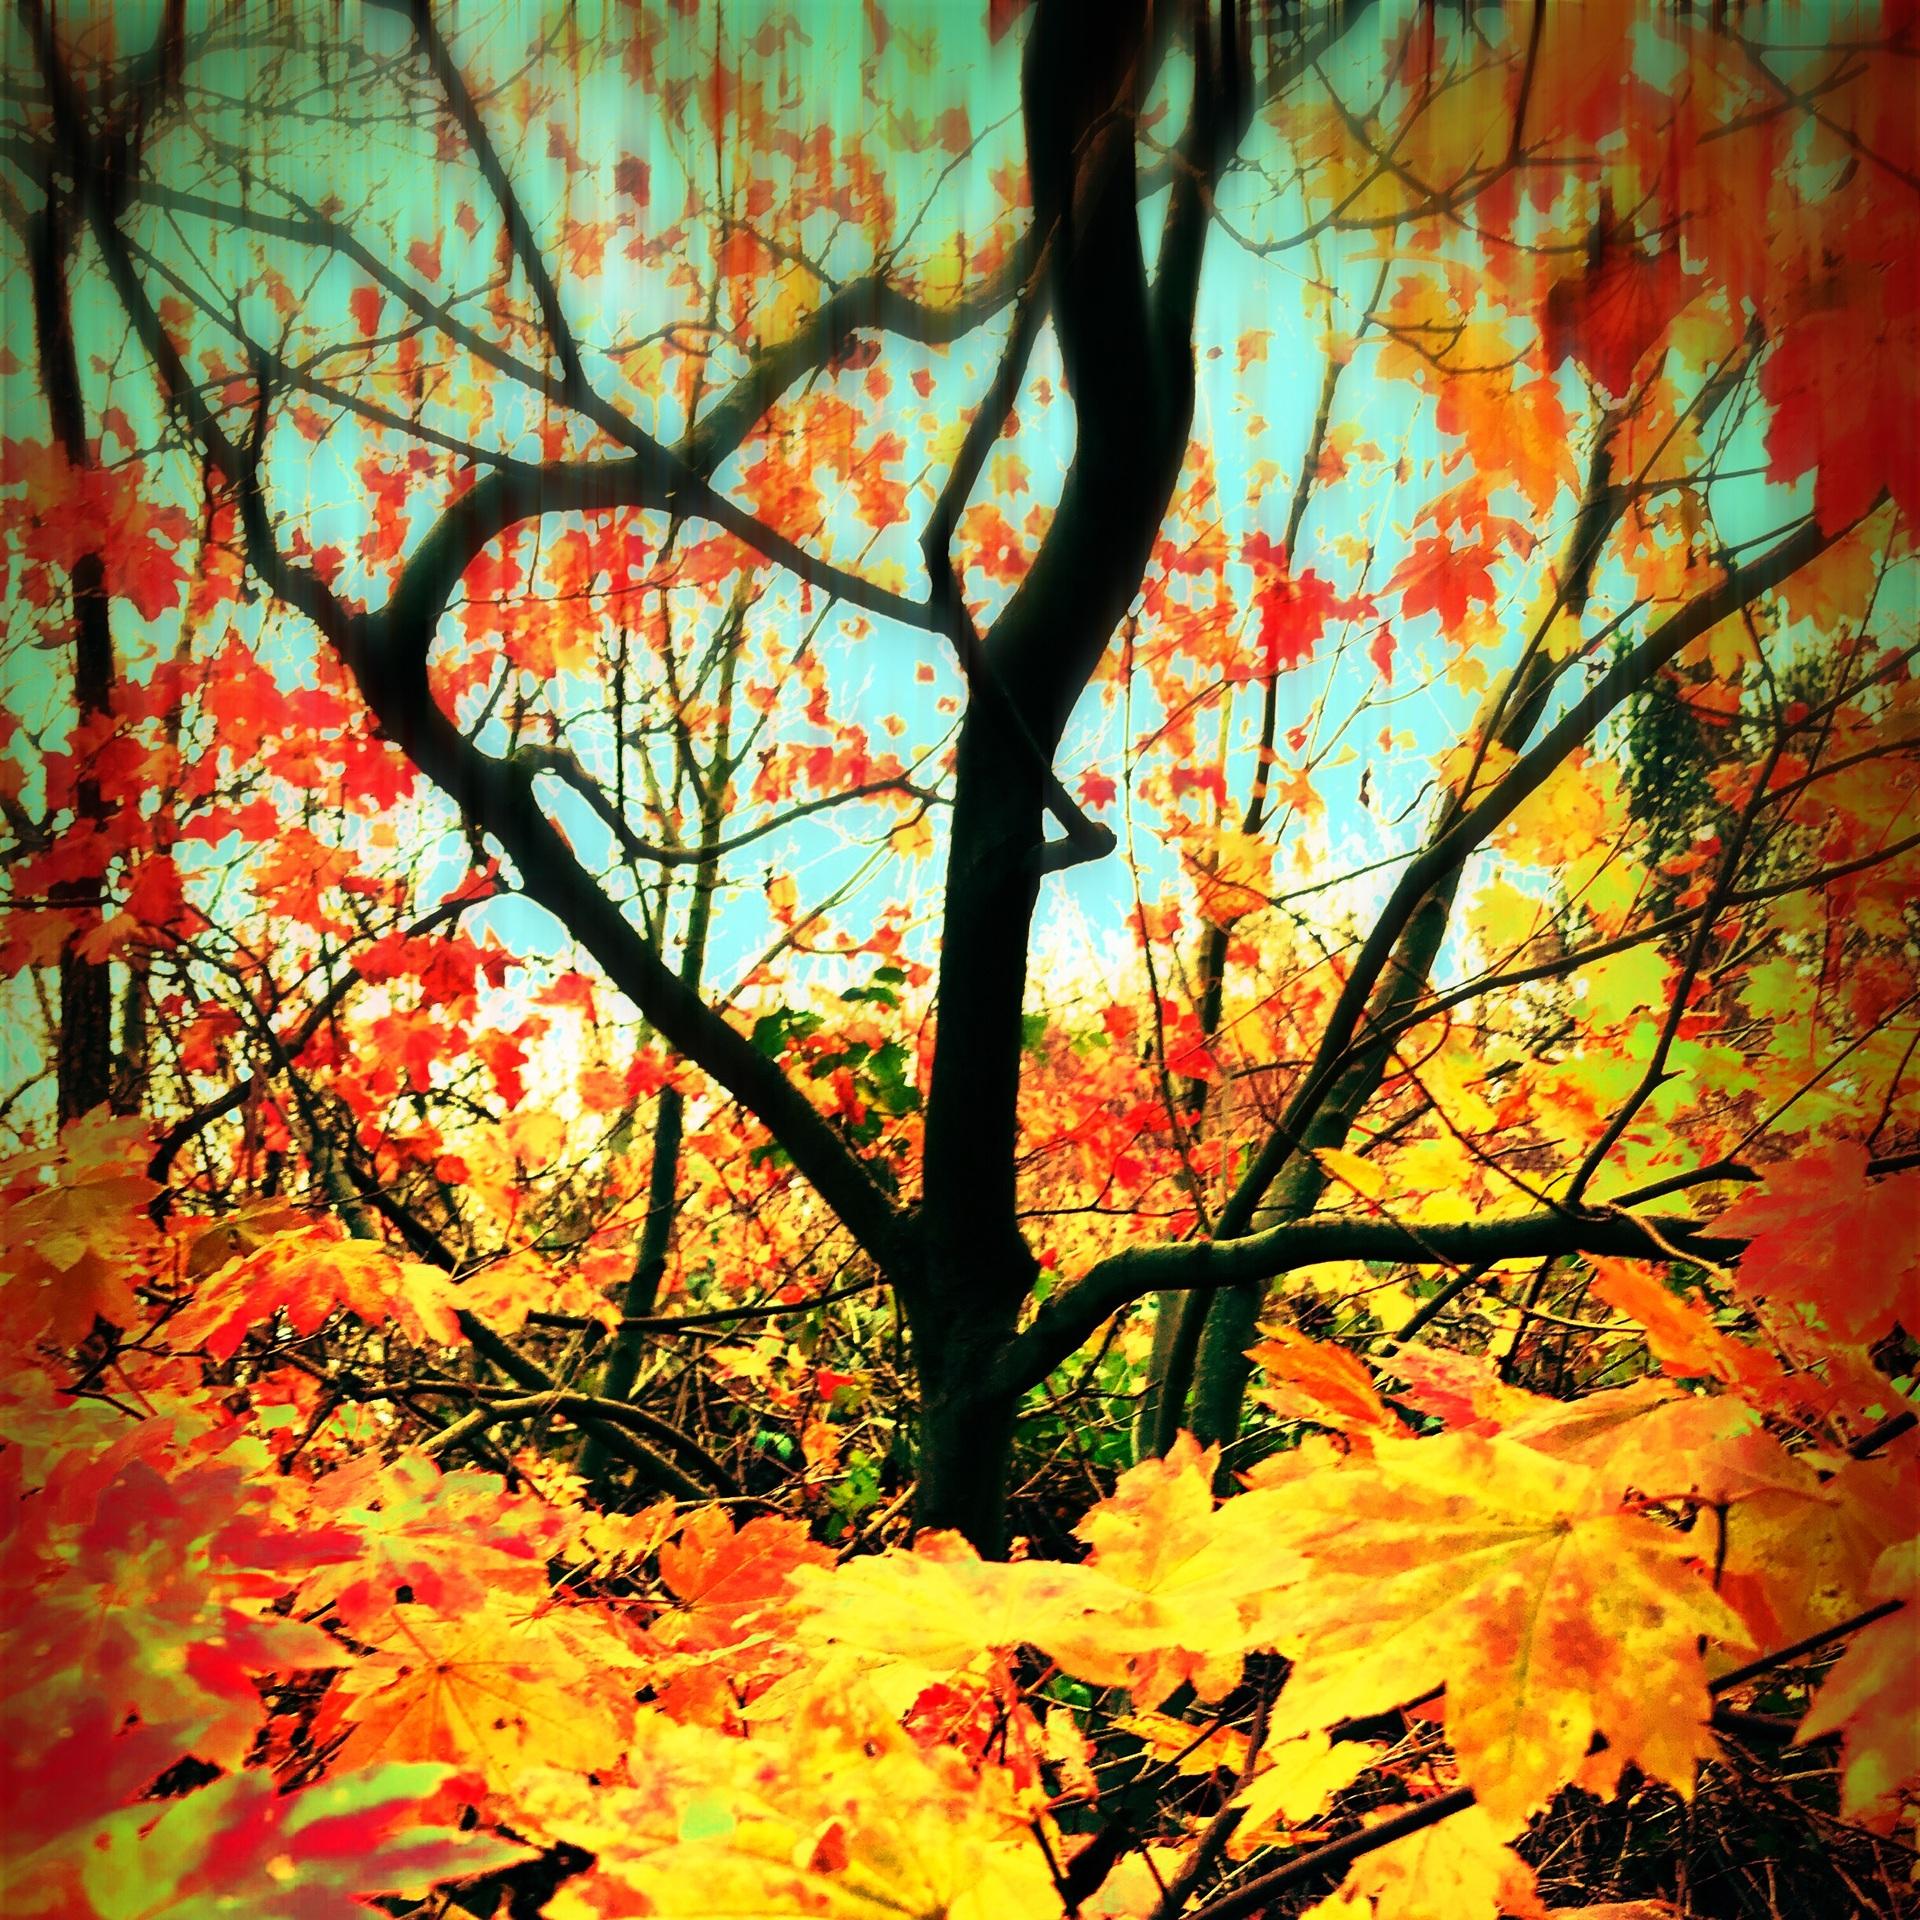 Autumnal maple tree abstract